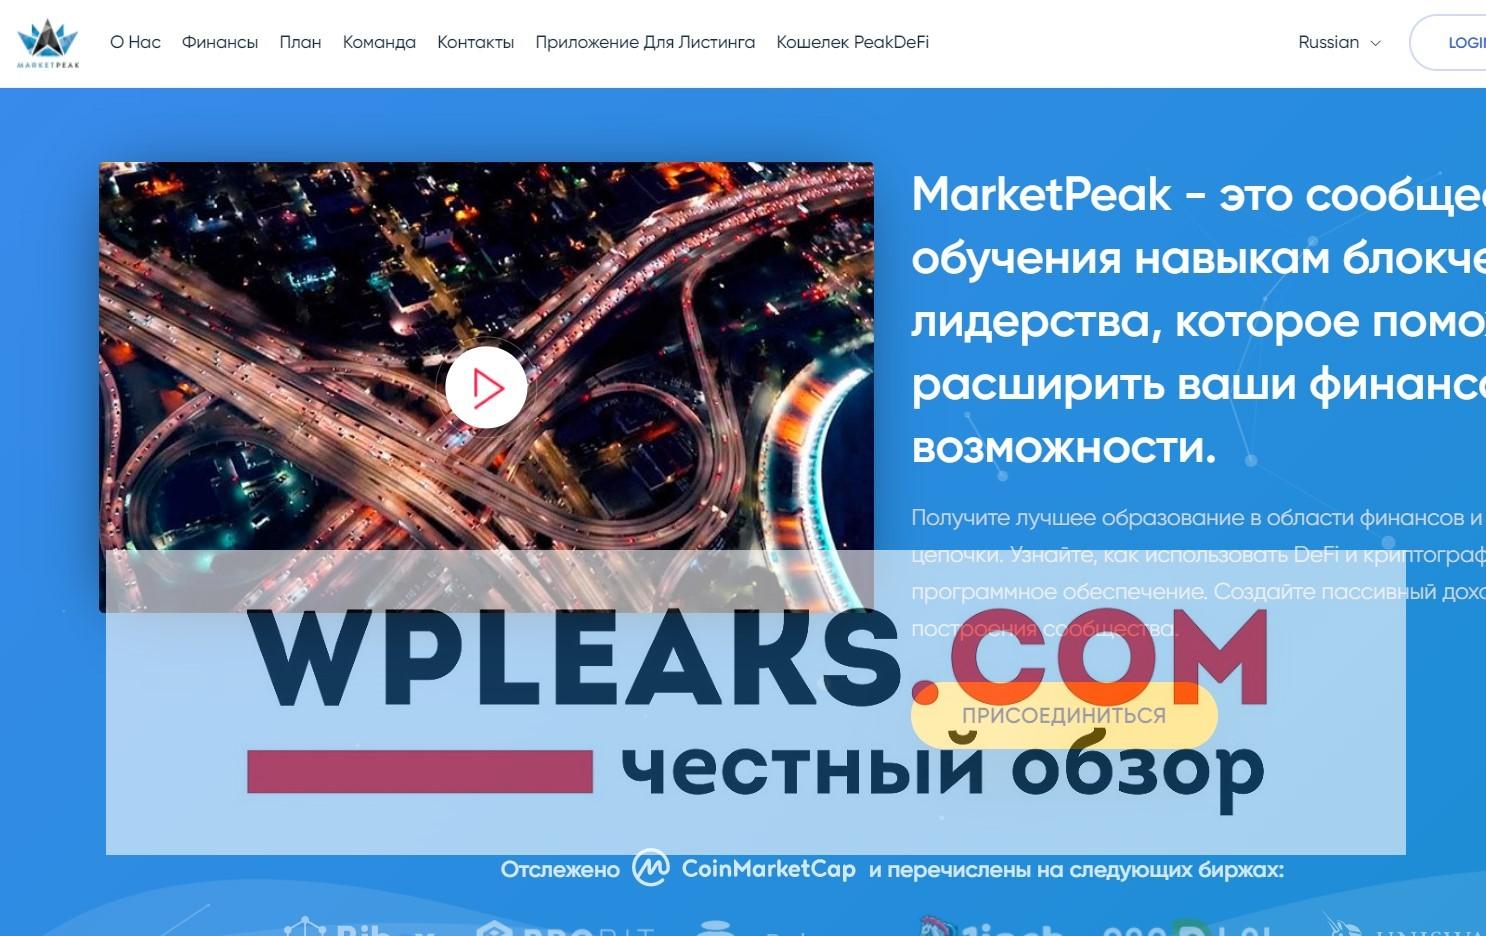 marketpeak.com отзывы